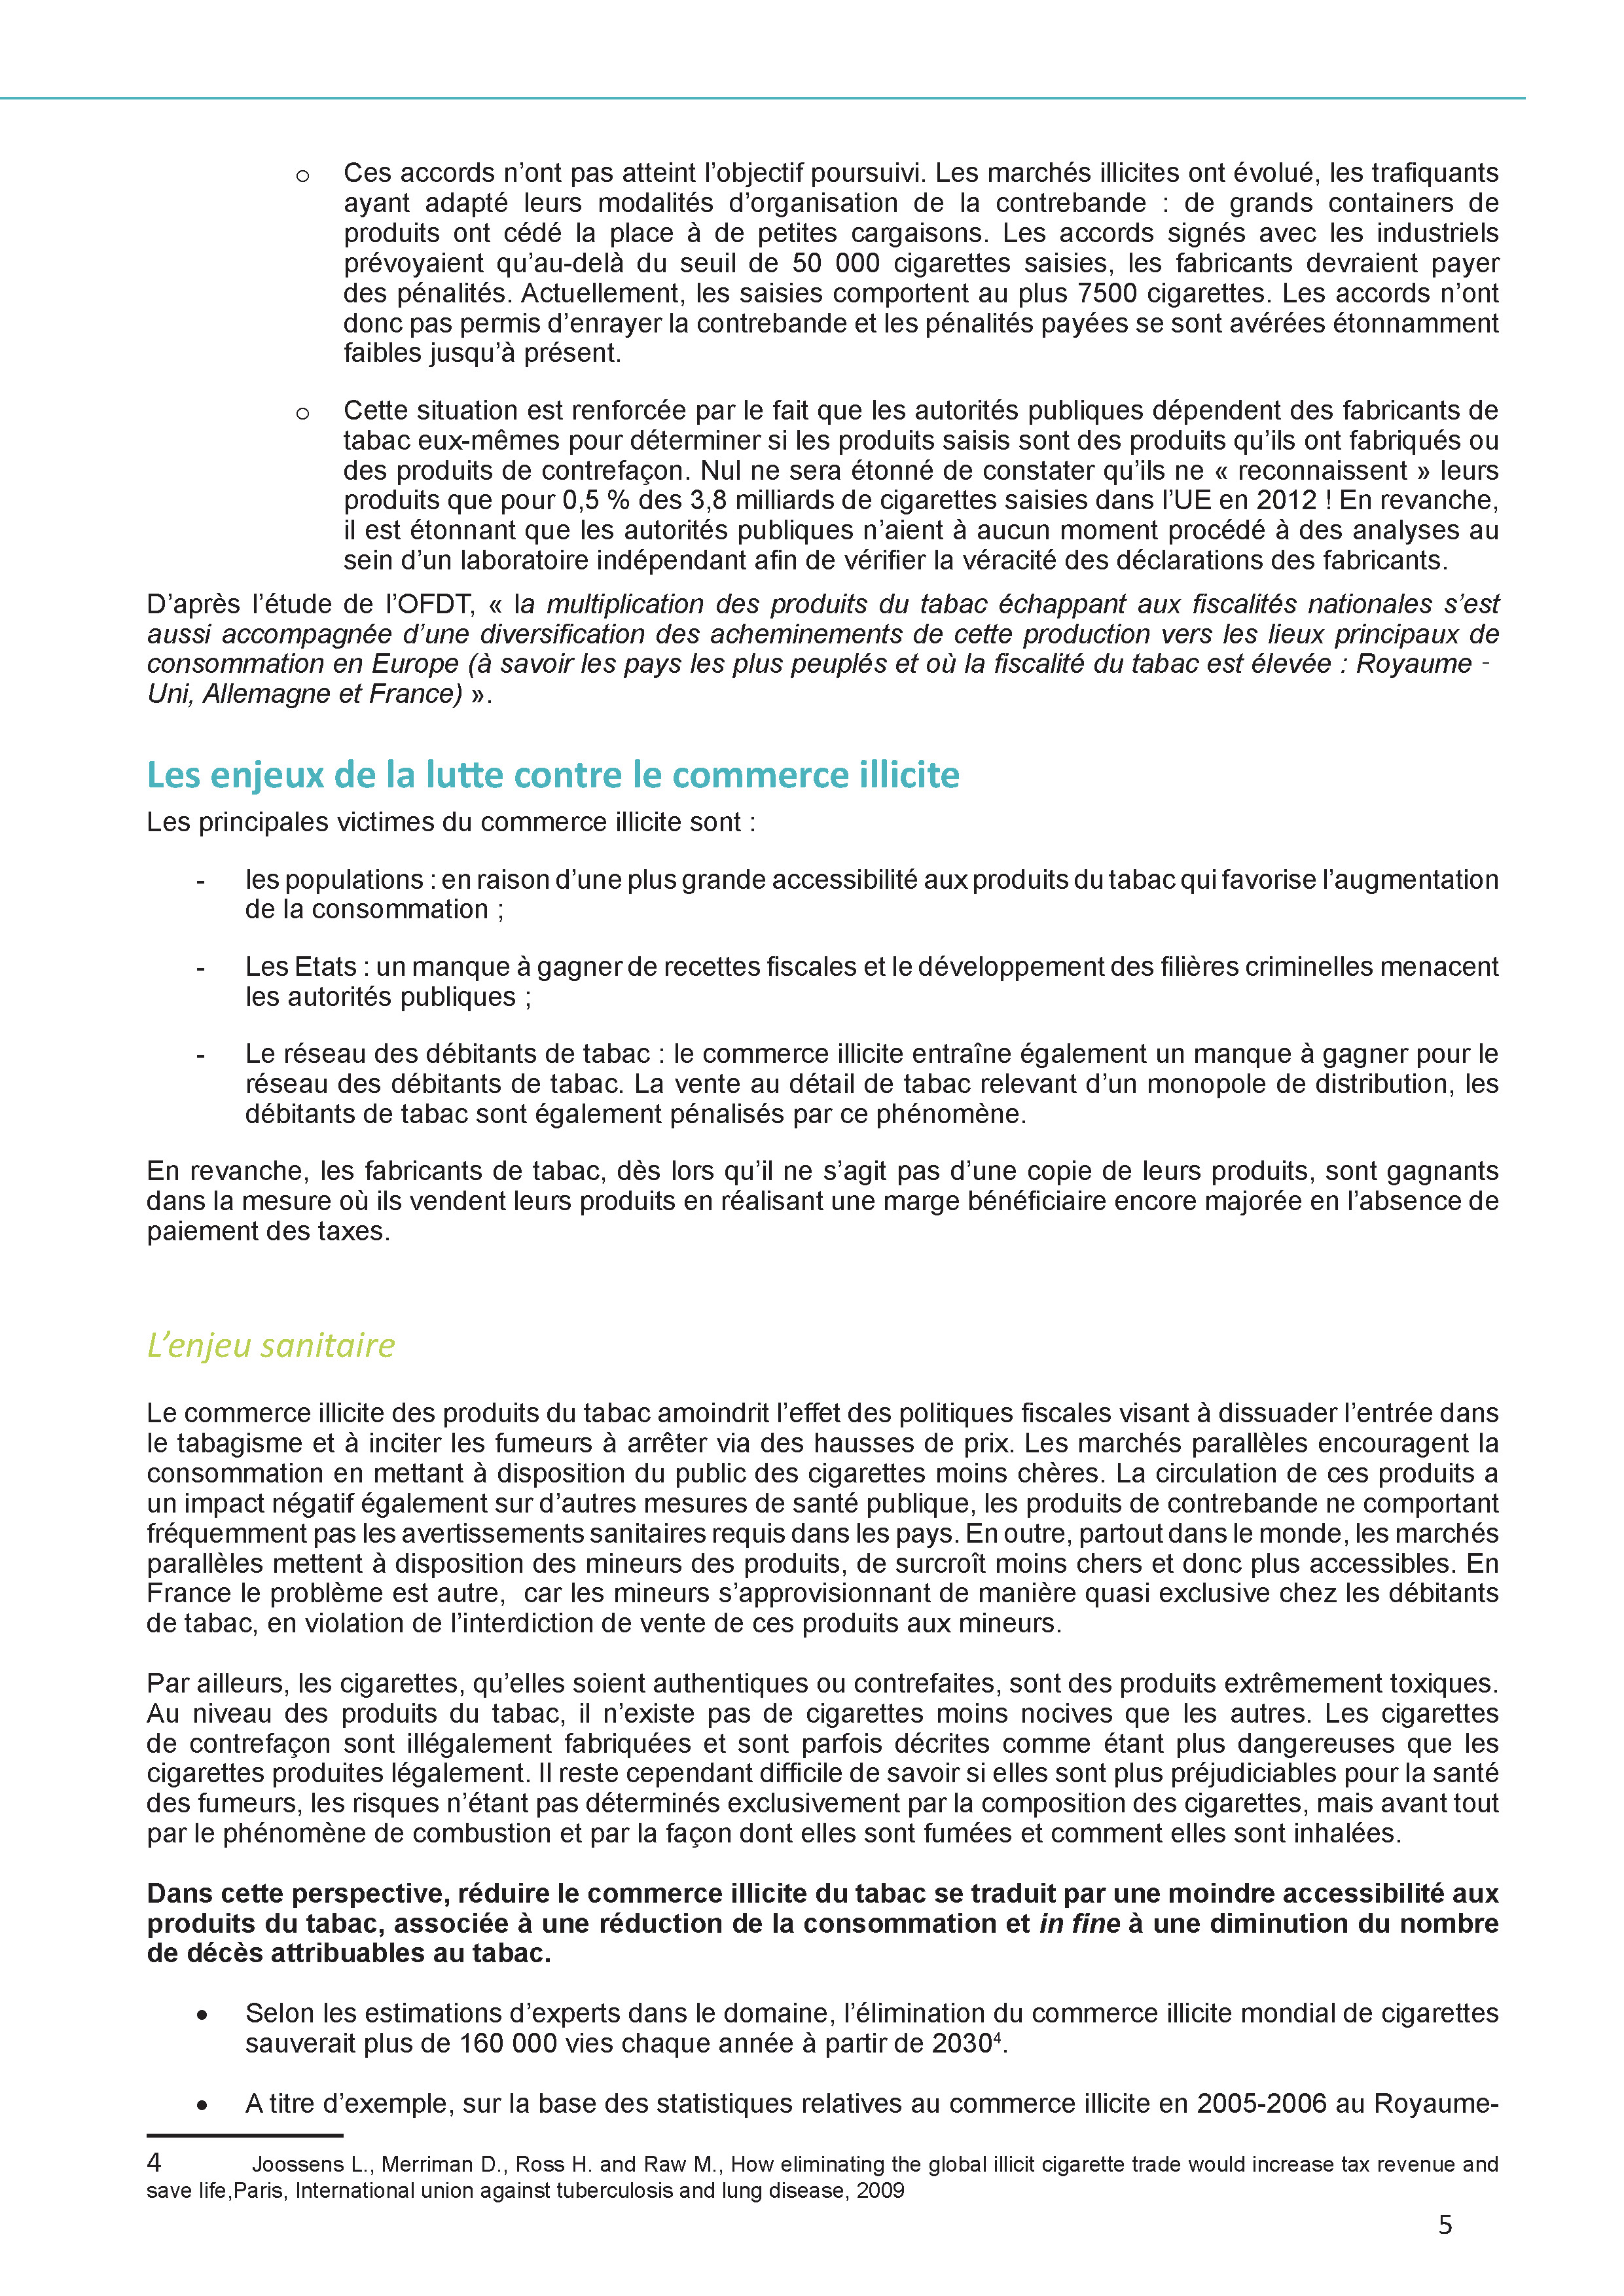 Alliance-DP_commerce-illicite-26mai2015_Page_05.jpg